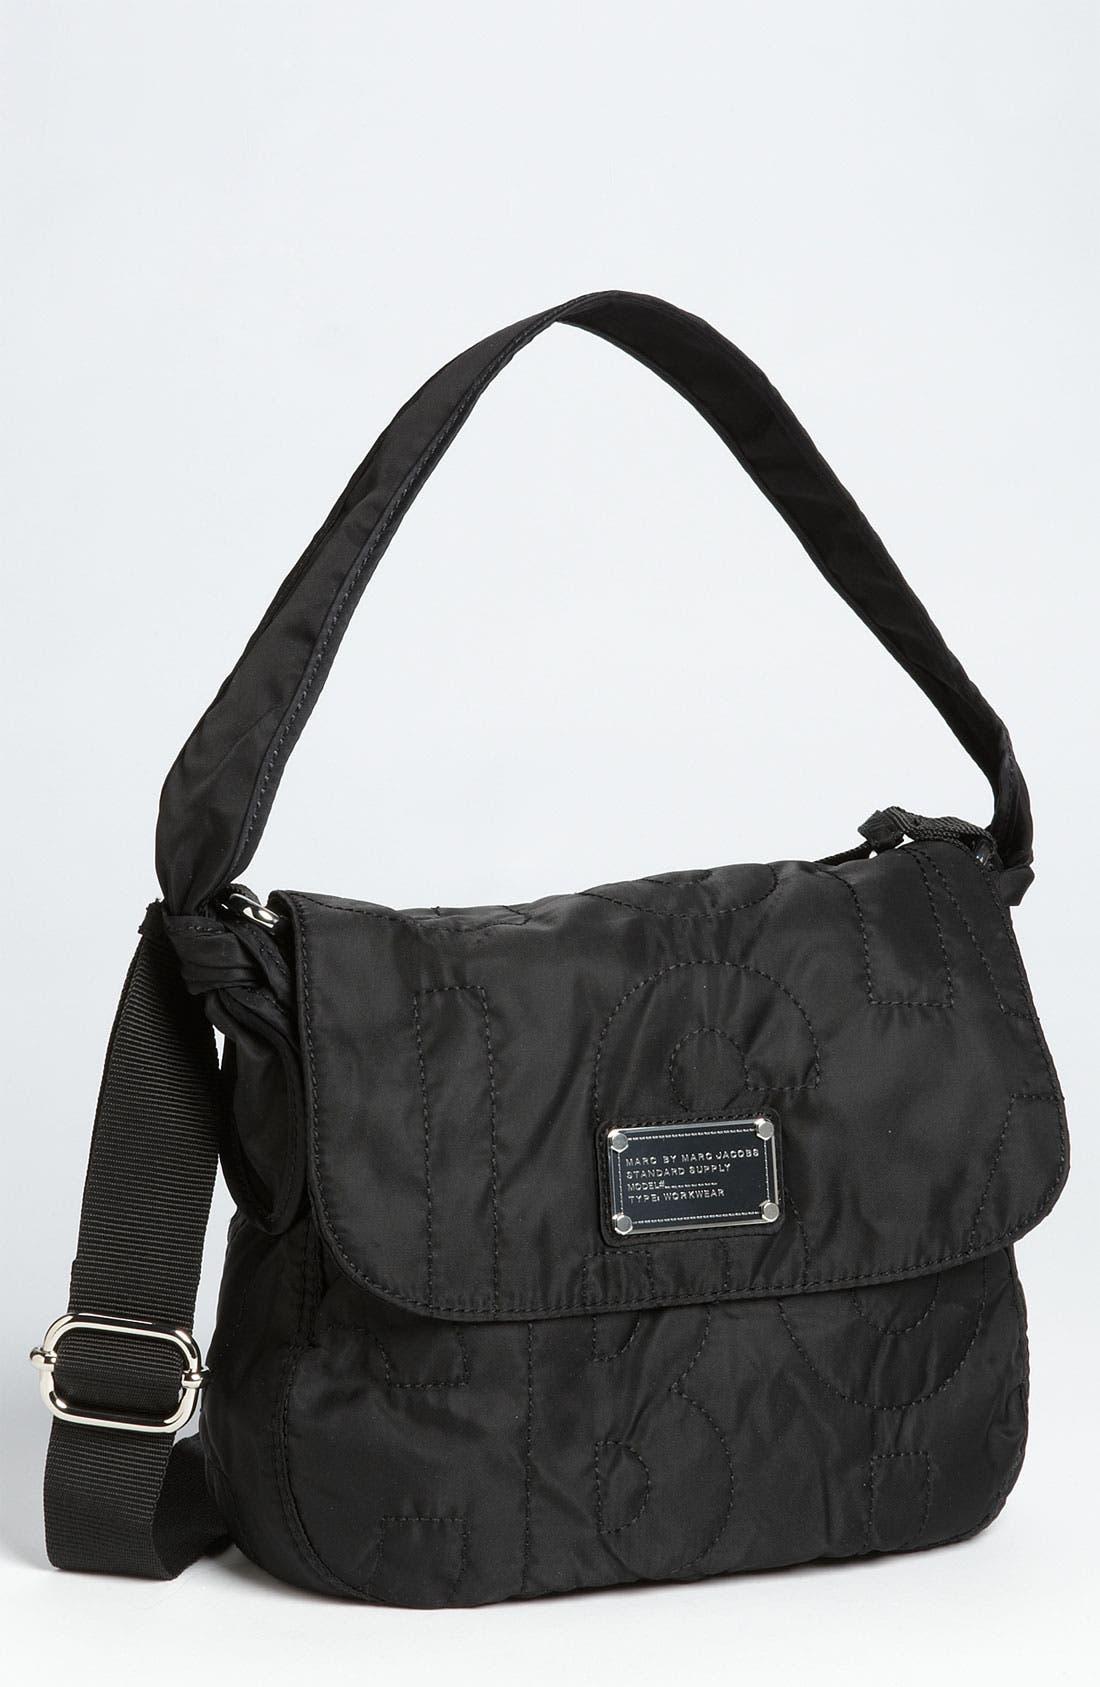 Alternate Image 1 Selected - MARC BY MARC JACOBS 'Pretty Nylon - Little Ukita' Convertible Crossbody Flap Bag